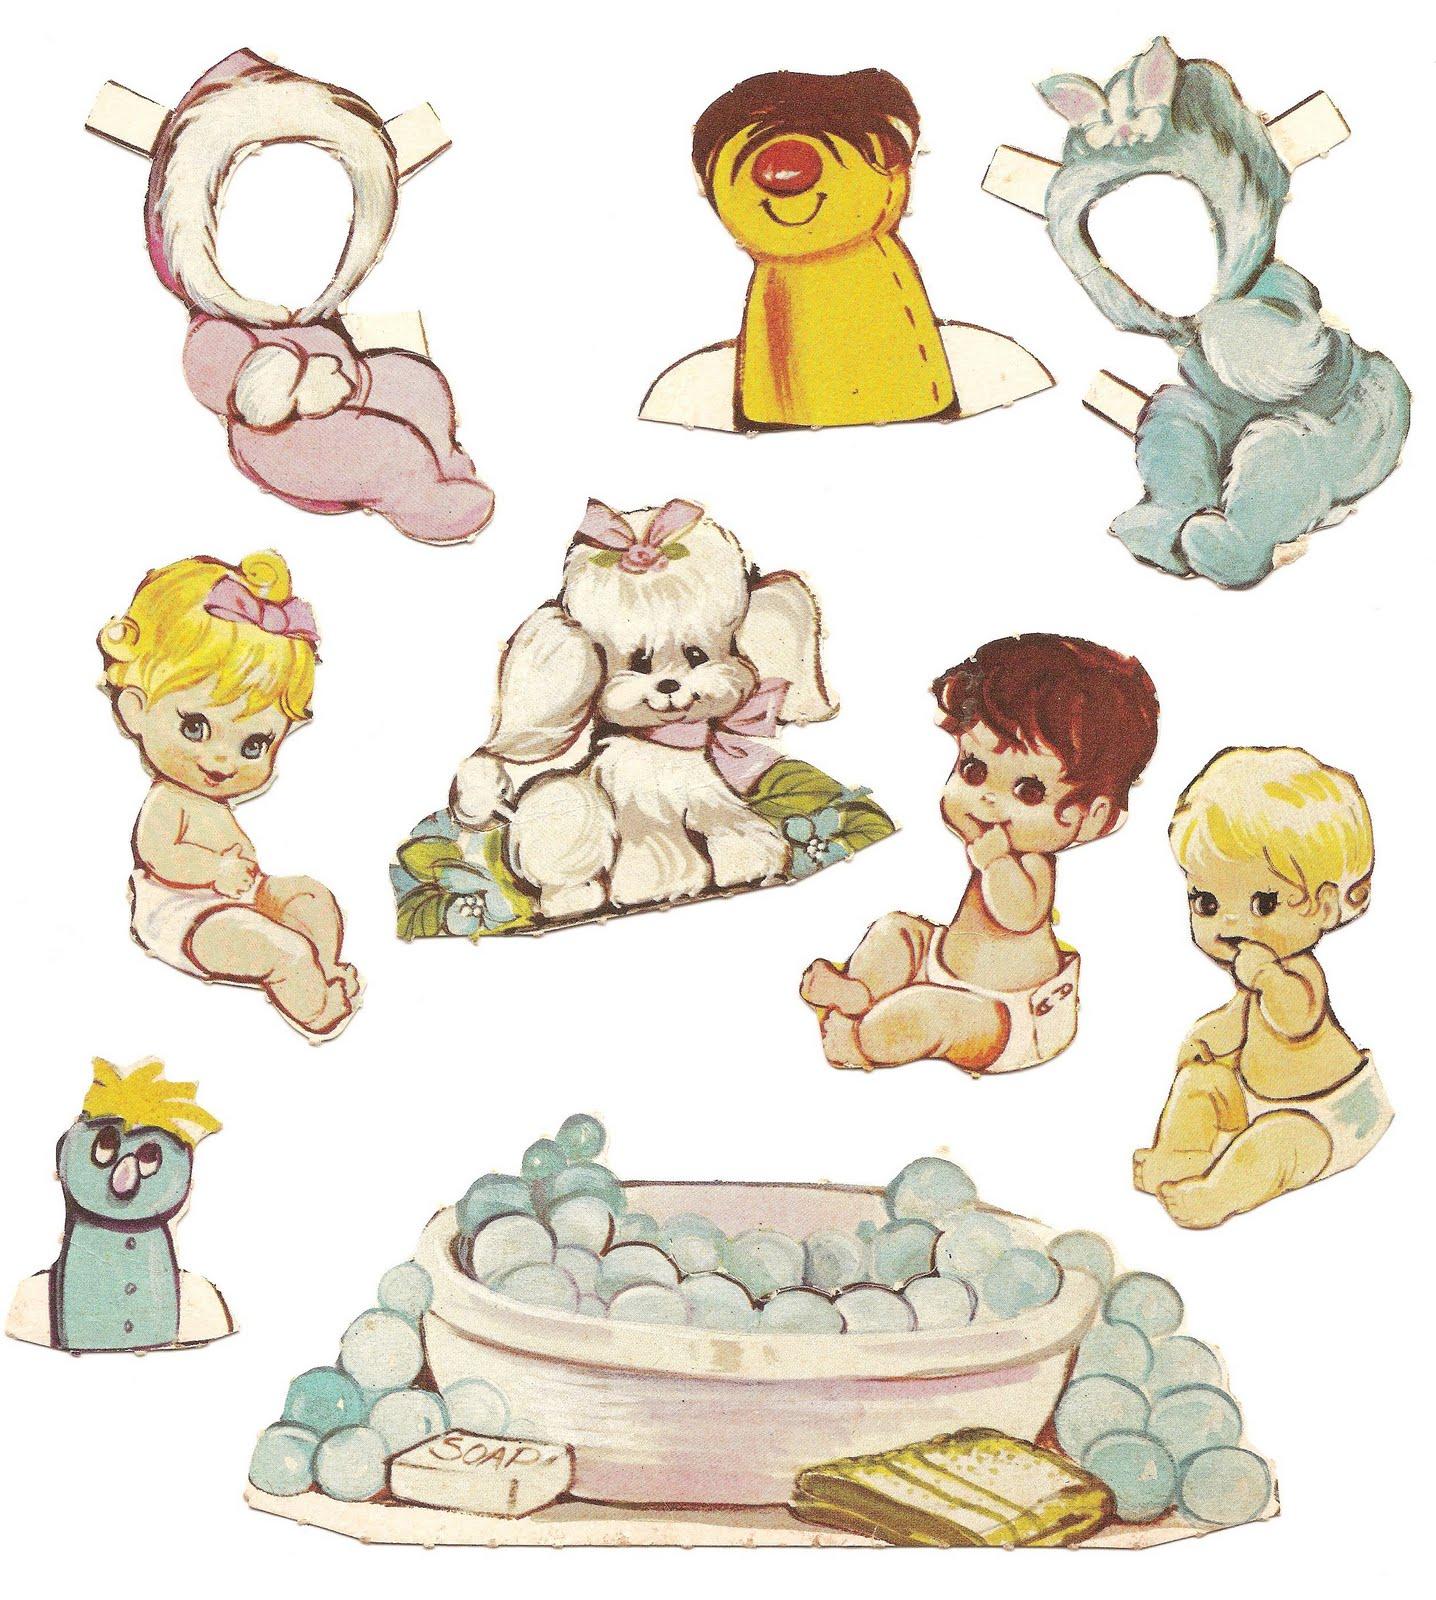 http://4.bp.blogspot.com/-LwThR-n1pXs/TylOr0Cu5PI/AAAAAAAABnY/ED5mkbIUs2c/s1600/candy+striper+babies.jpg